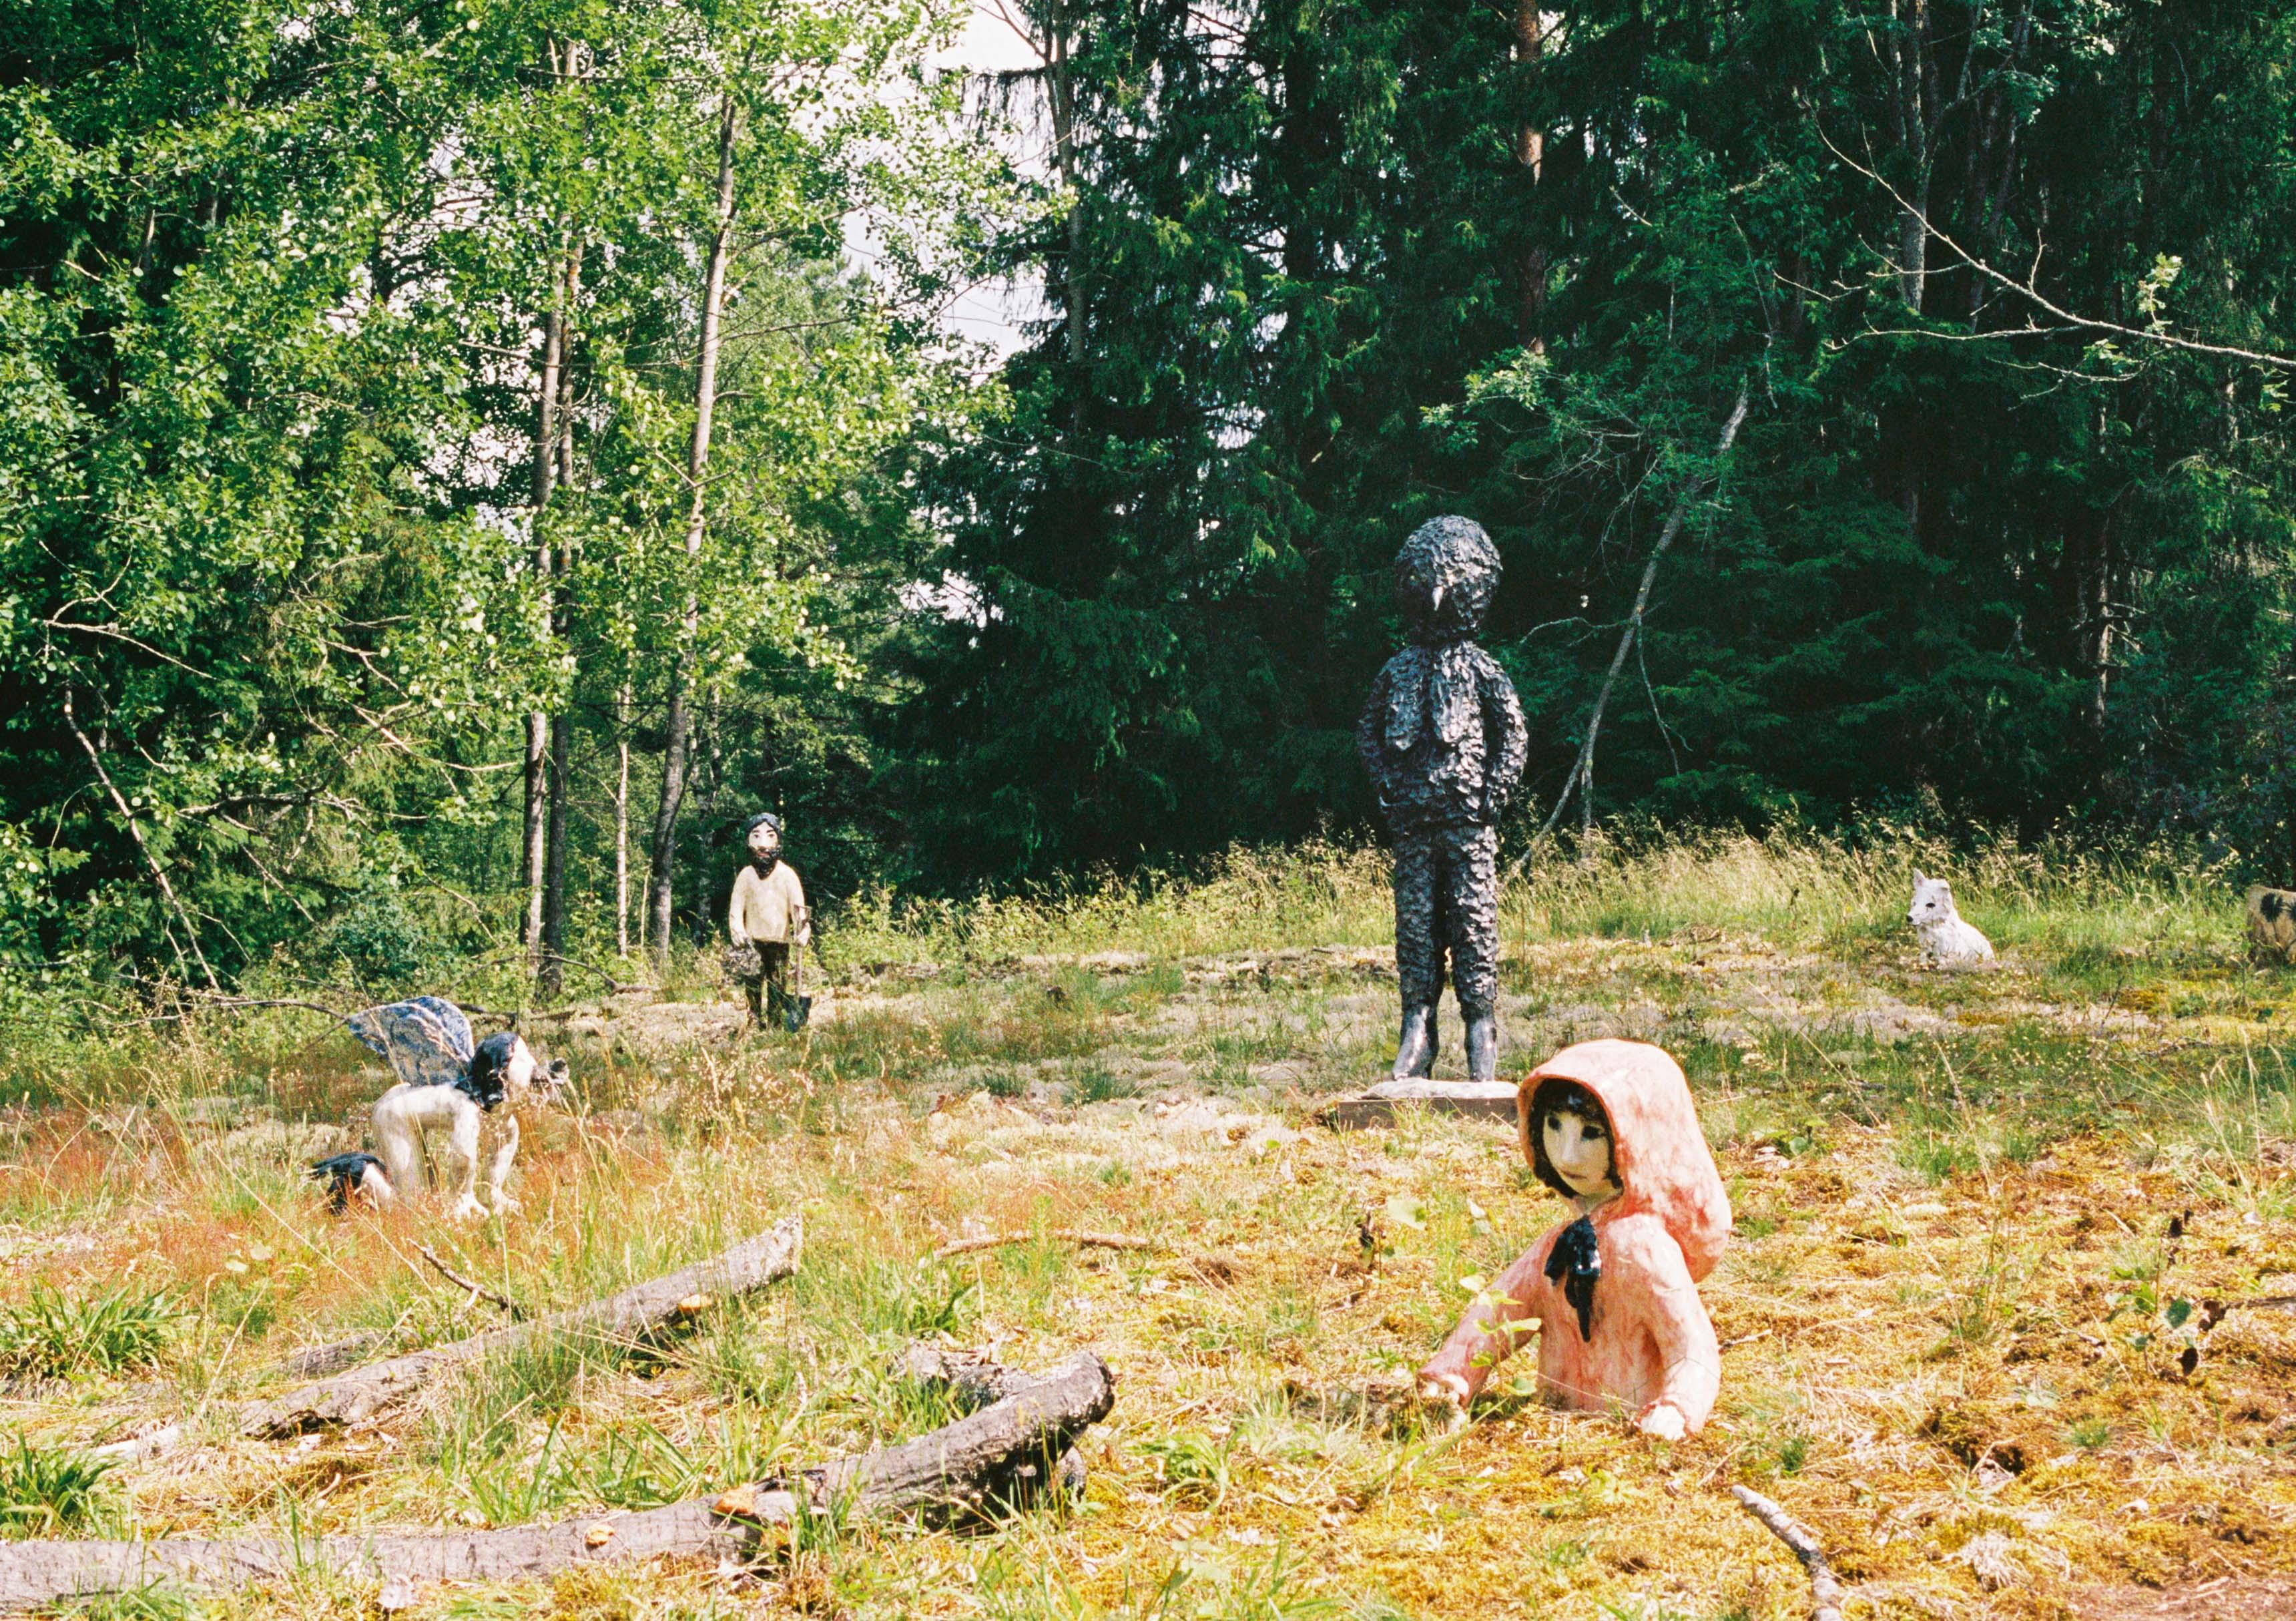 De gauche à droite : On Her Knees (2017), céramique, 47 x 55 x 33 cm. The Gardener (2016), céramique, 75 x 30 x 20 cm. Dark Bird (2017), céramique, 132 x 42 x 35 cm. Little Red Riding Hood (2016), céramique, 48 x 38 x 30 cm. Tanja (2015), céramique, 36 x 39 x 19 cm.